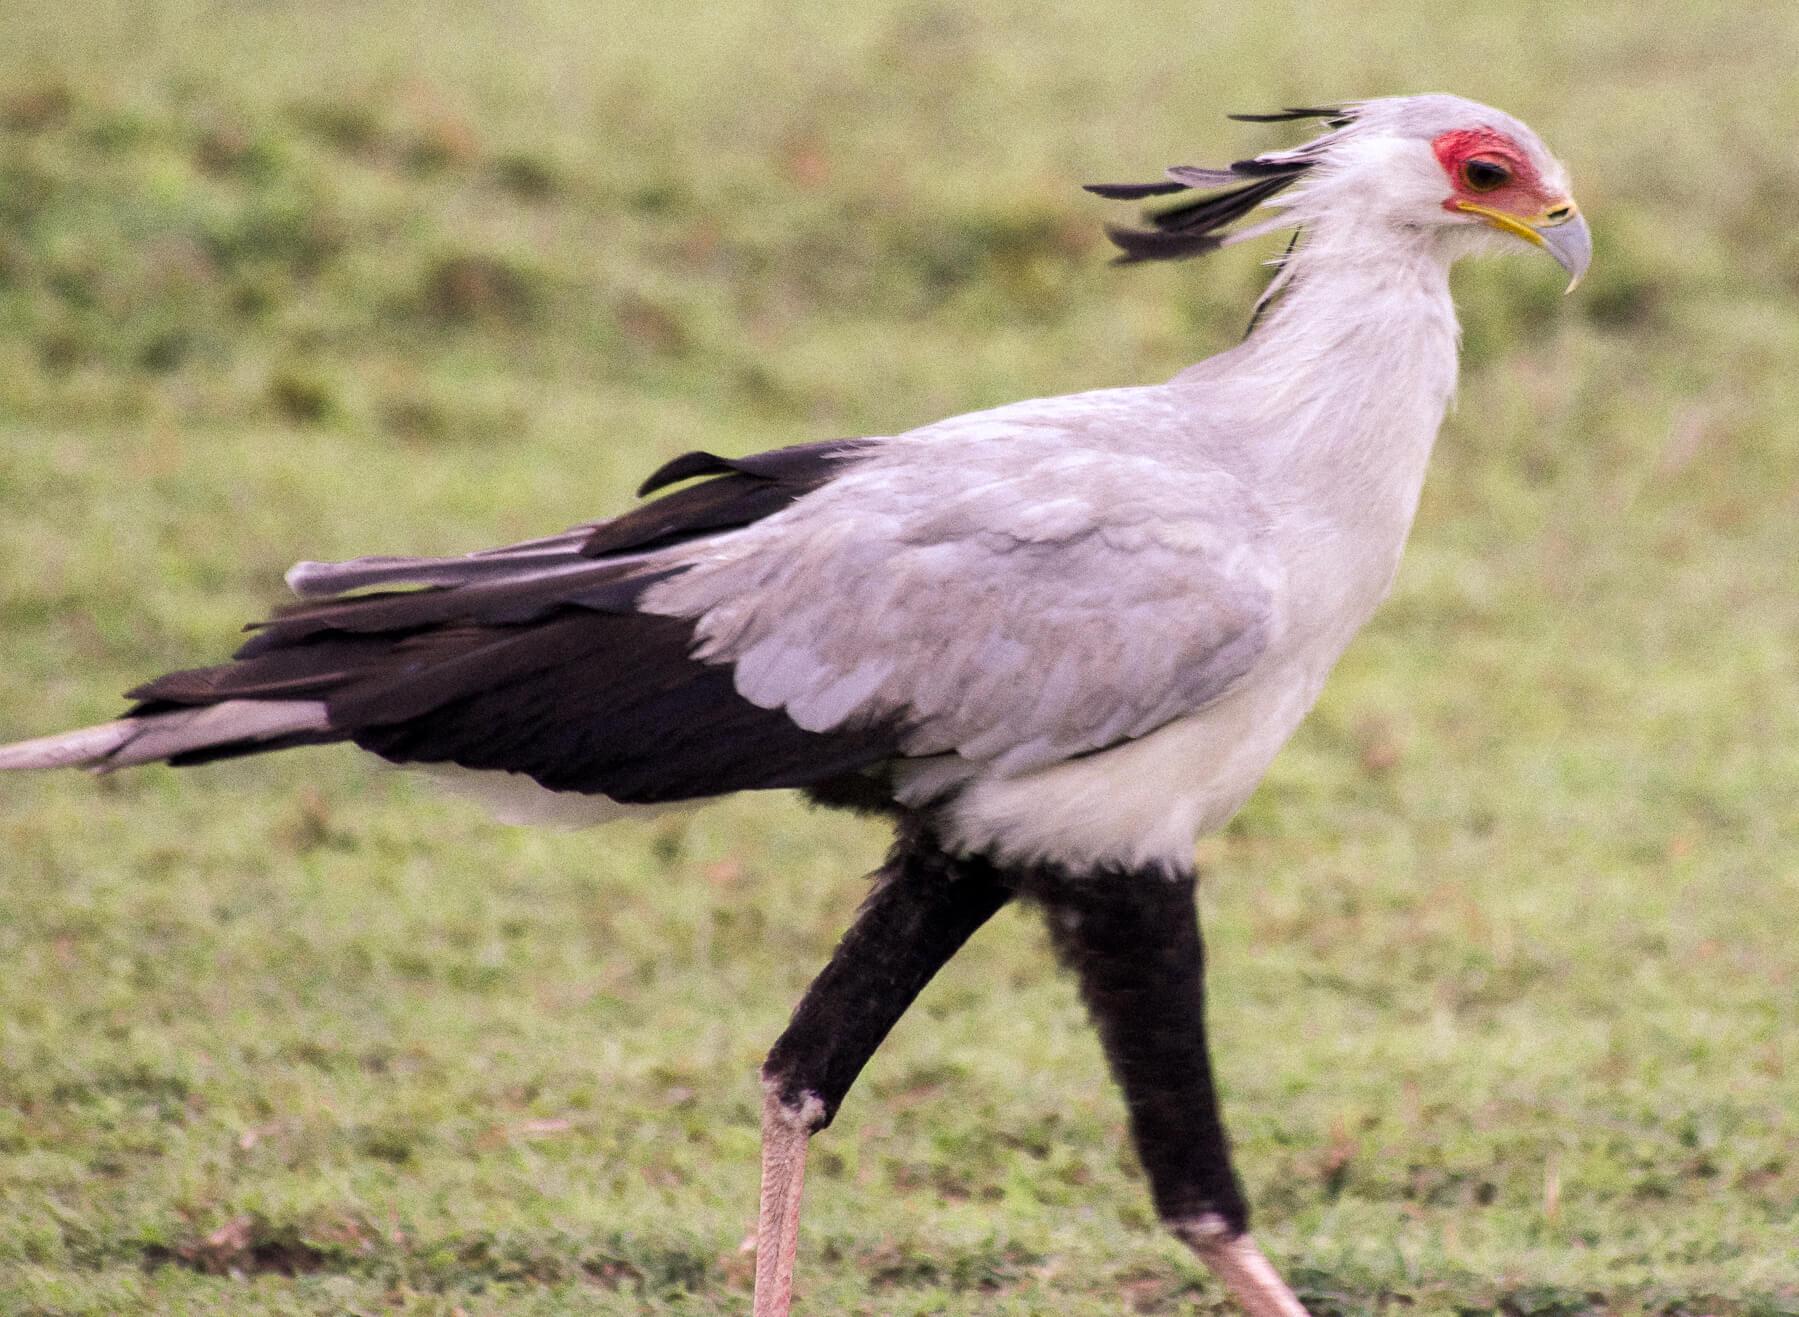 A big white Secretary bird walking in the Maasai Mara with red eyes, yellow beak and LONG black legs